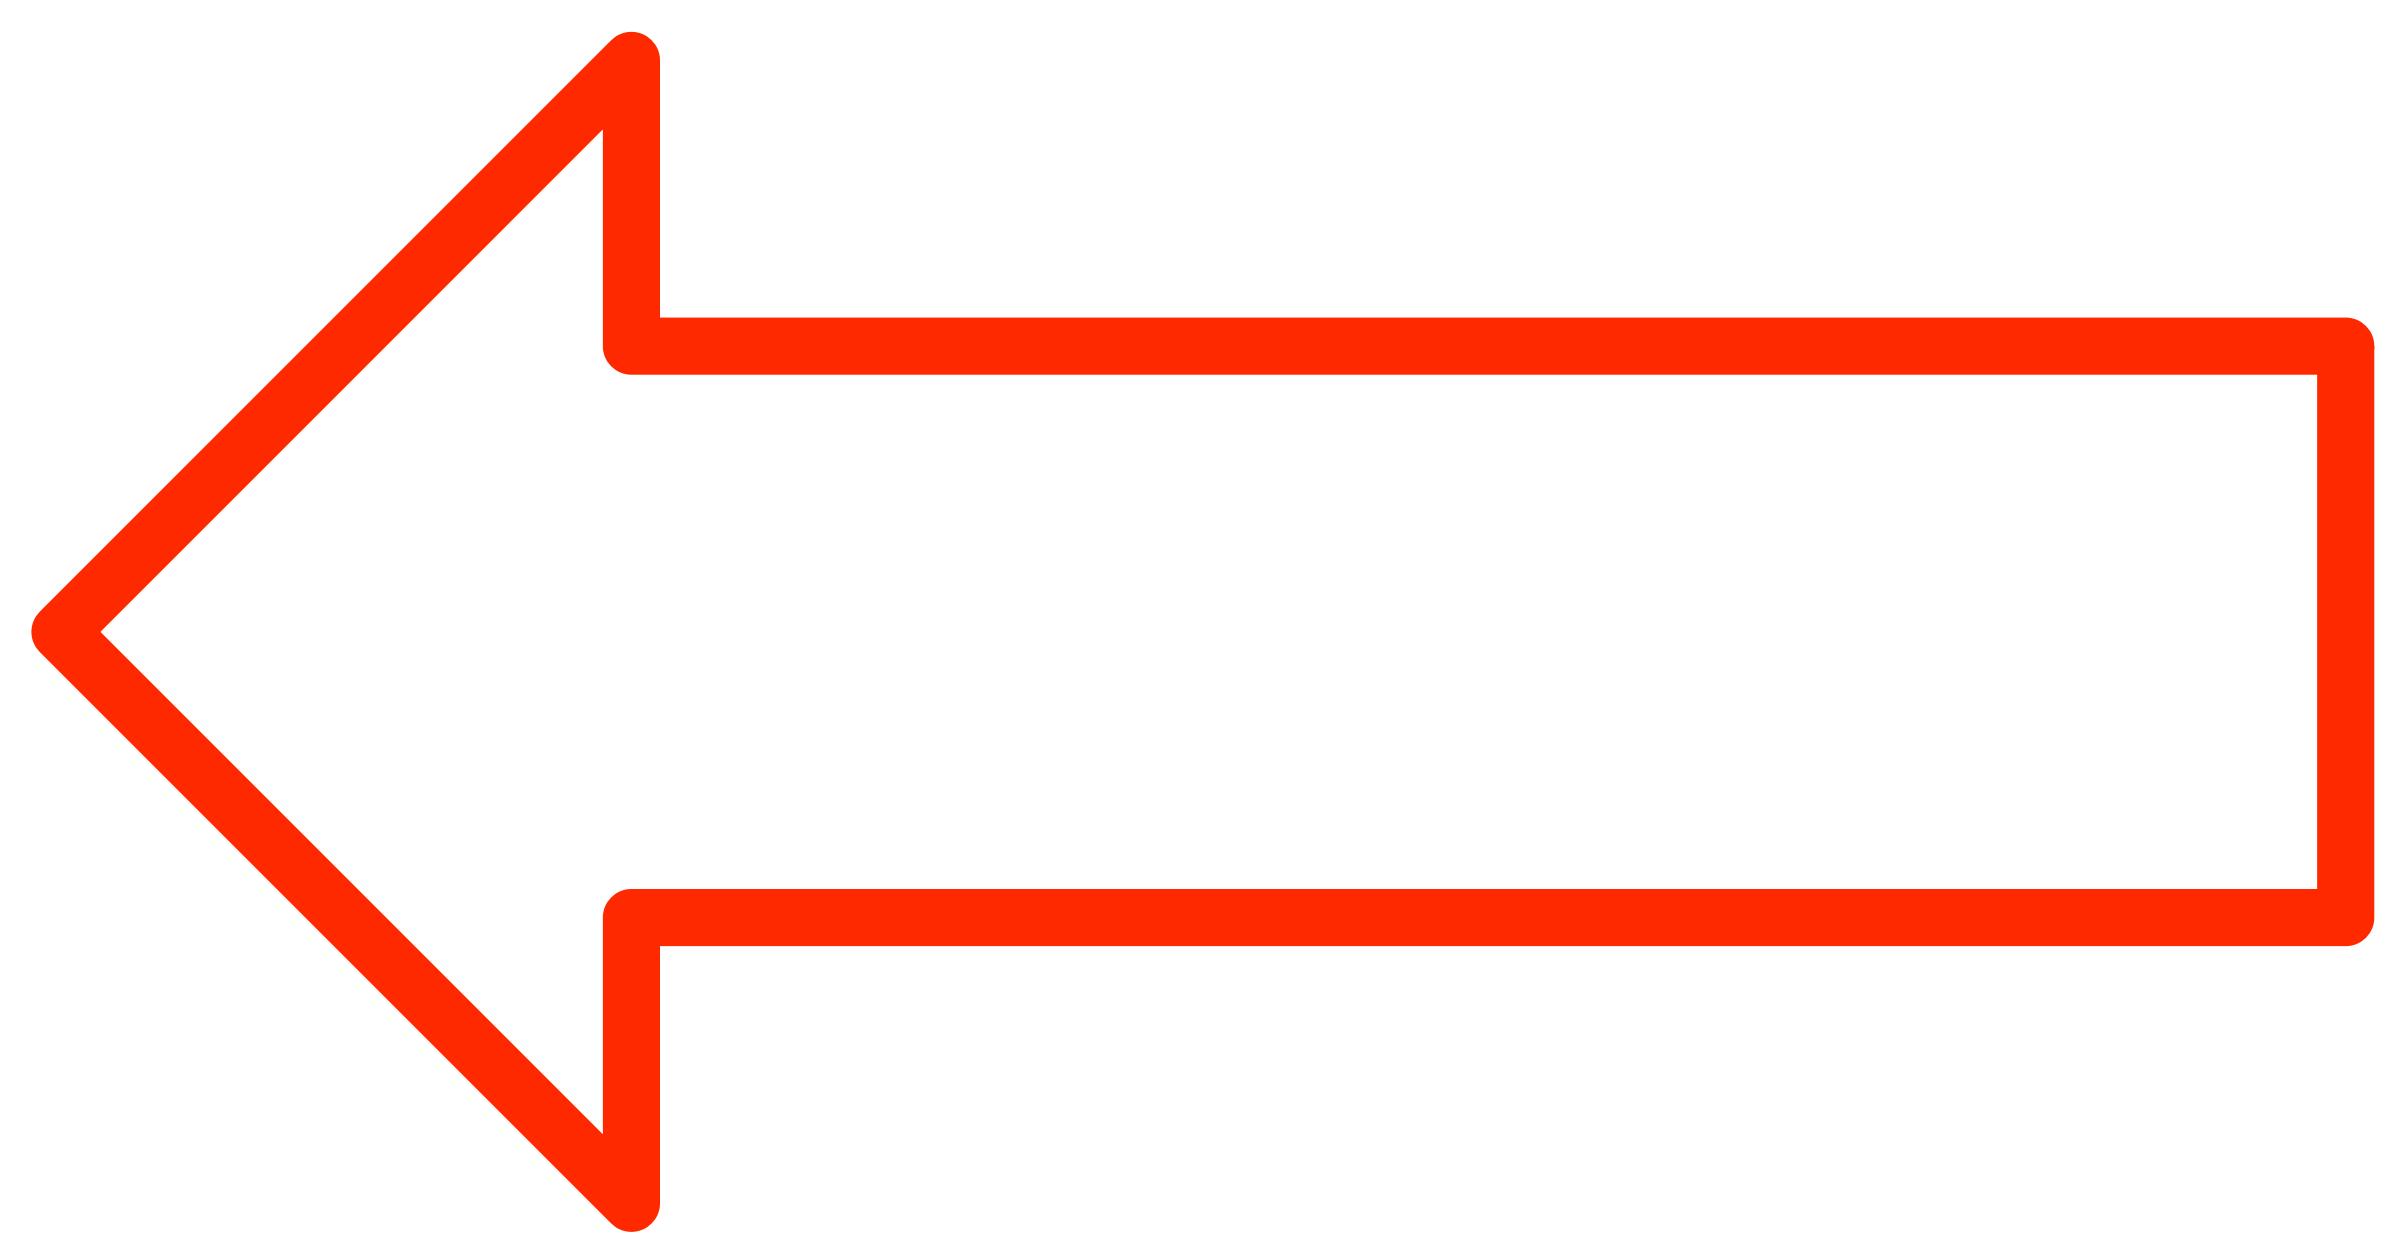 clipart arrow outline - photo #49